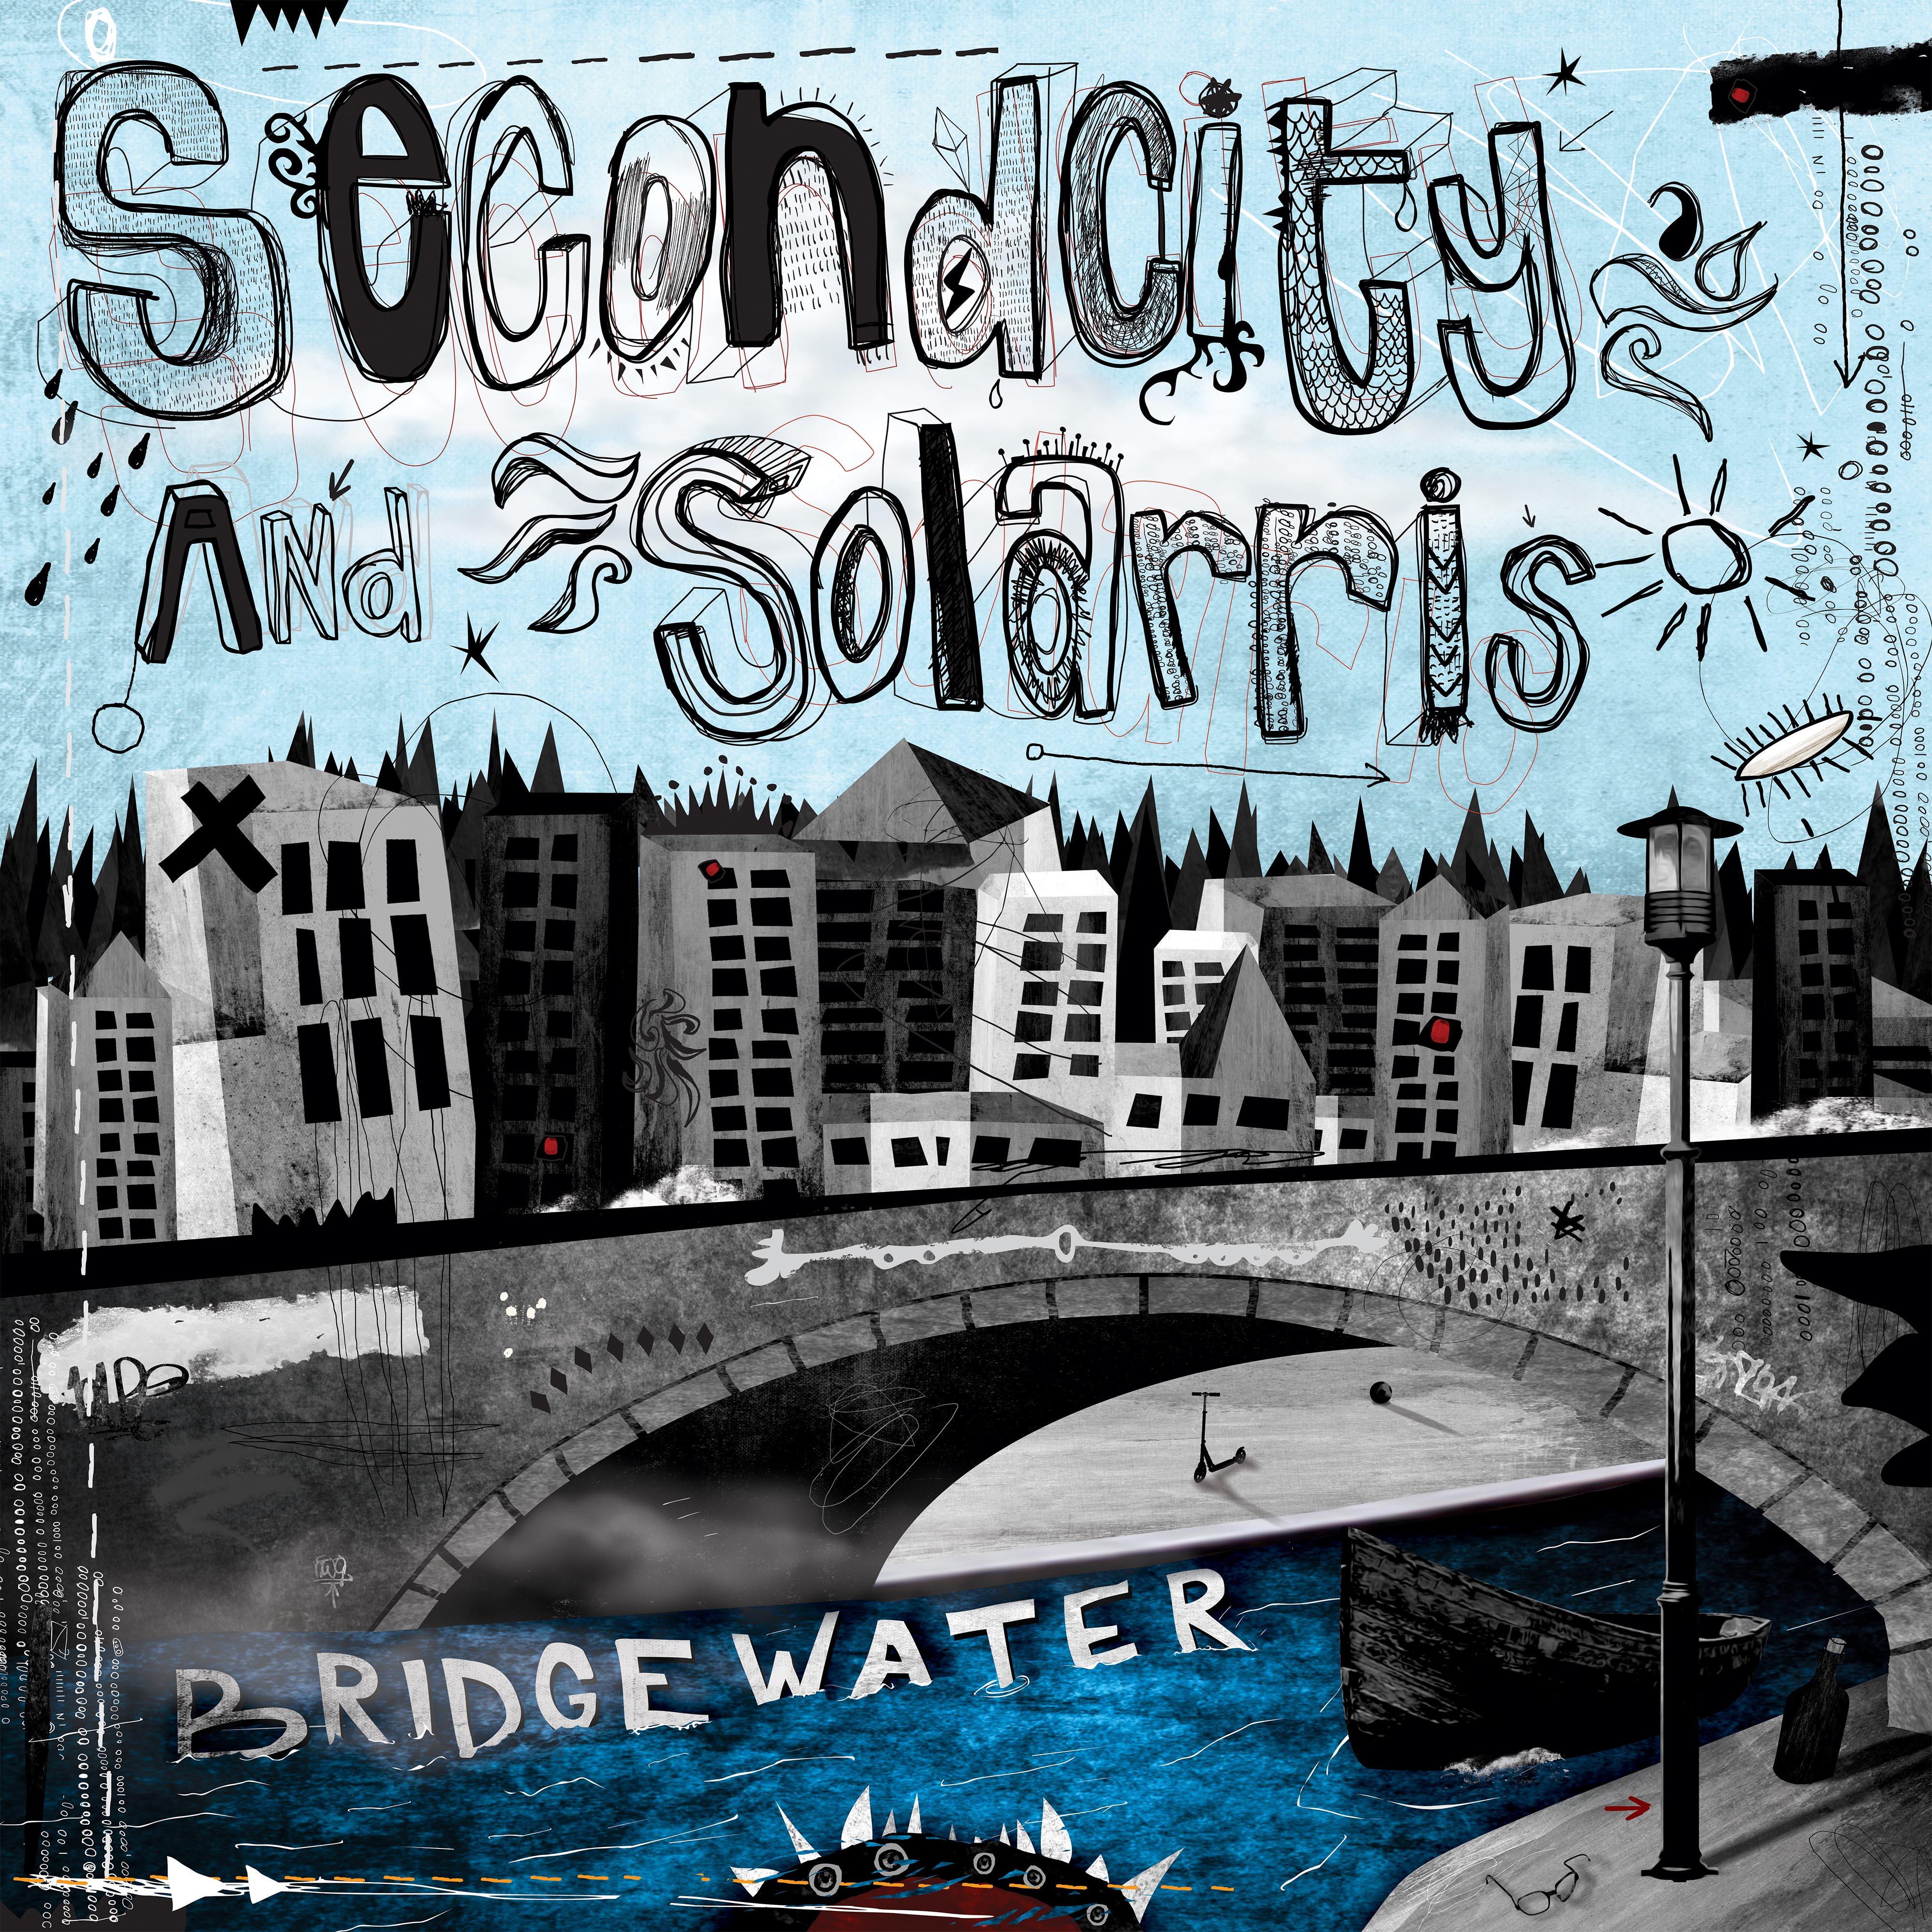 packshot_secondcity_solarris_-_bridgewater_-_gruuv.jpg